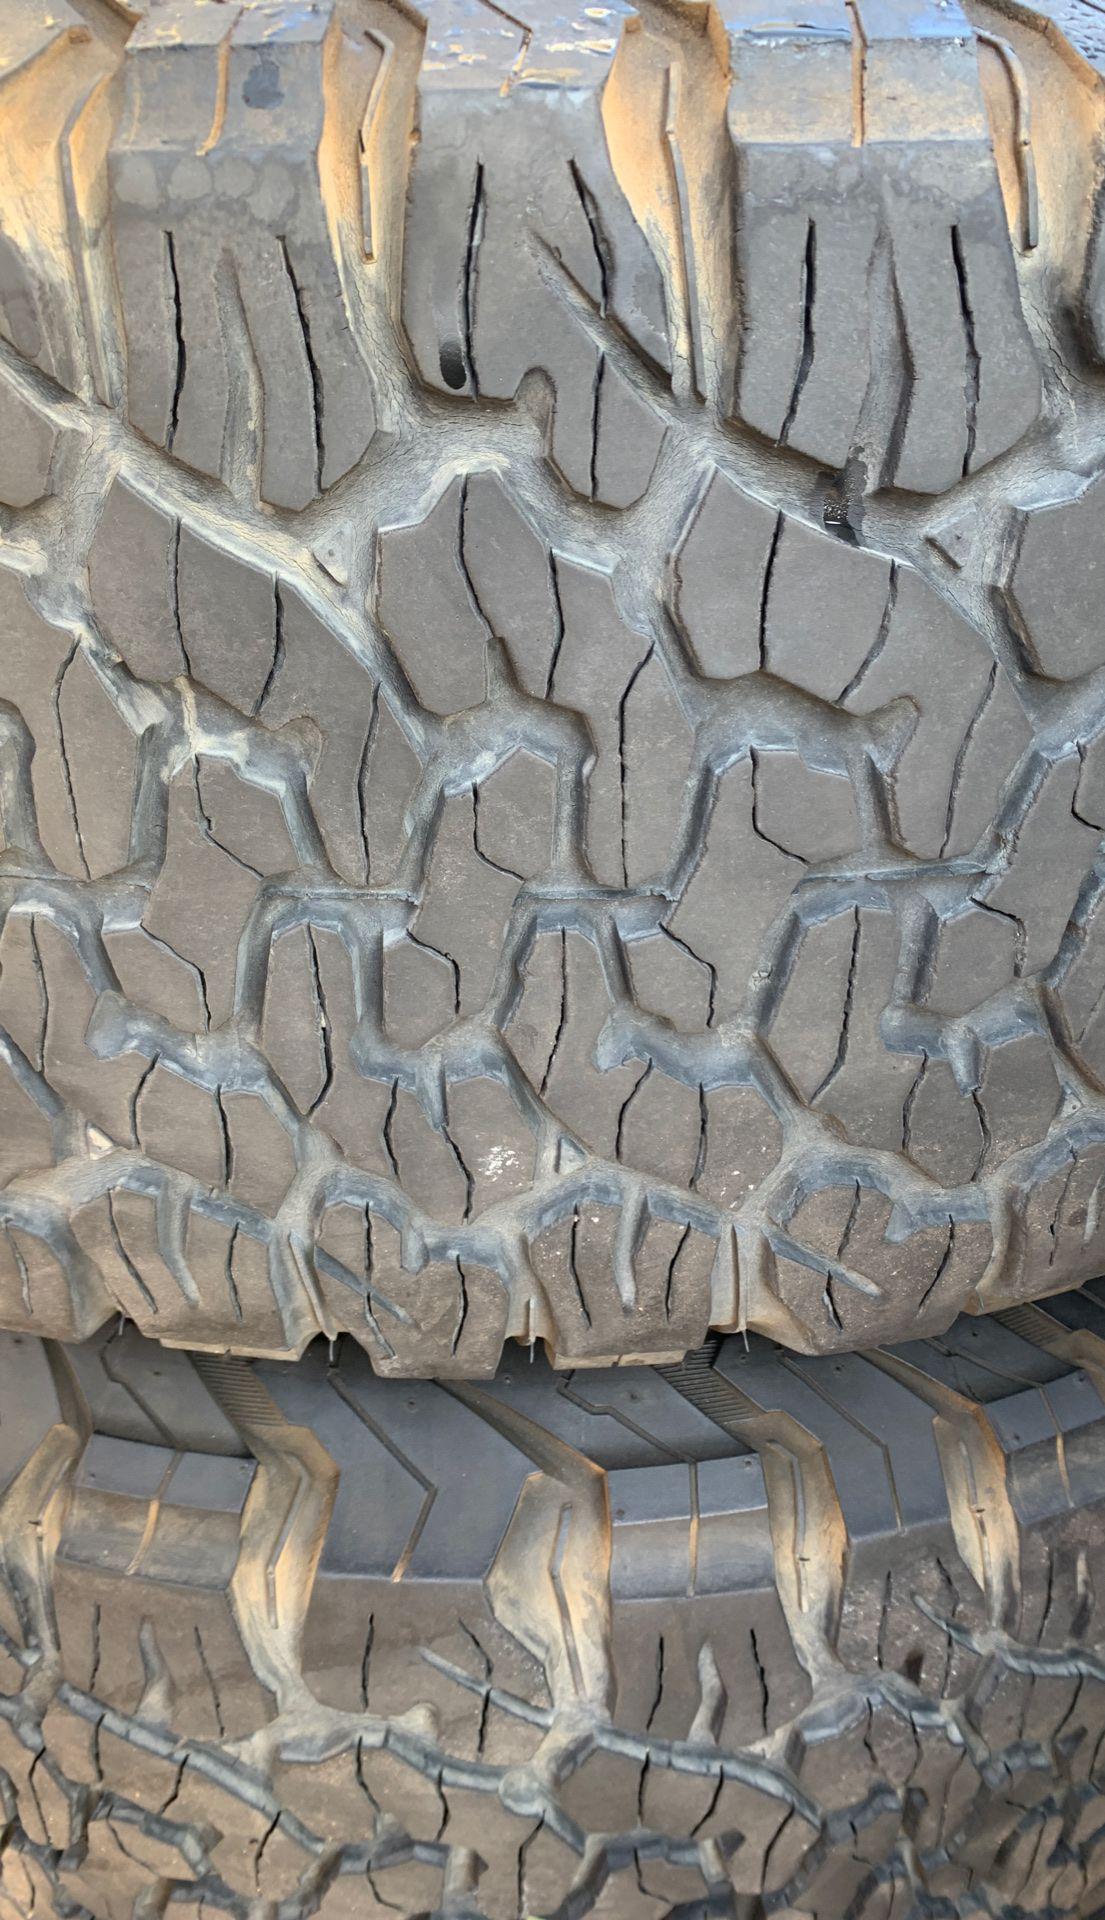 "4 rims and tires 16"" Ford 2500 3500 8 lugs tires 70% tread bfgoodrich ko2 305/70r16"